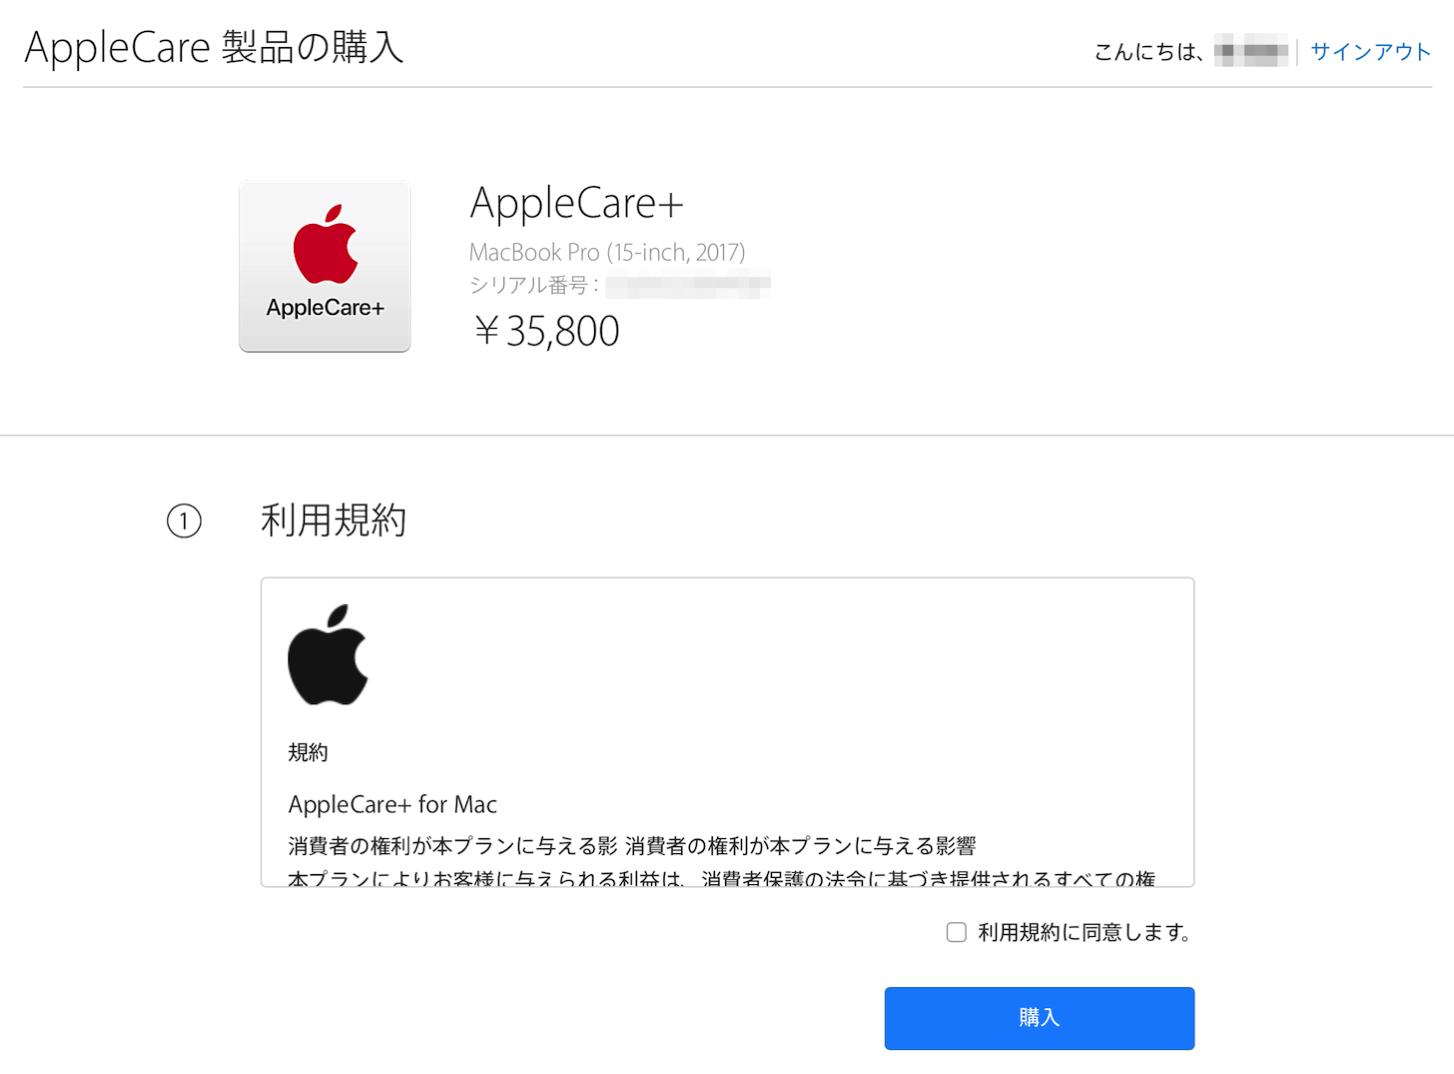 AppleCare 02